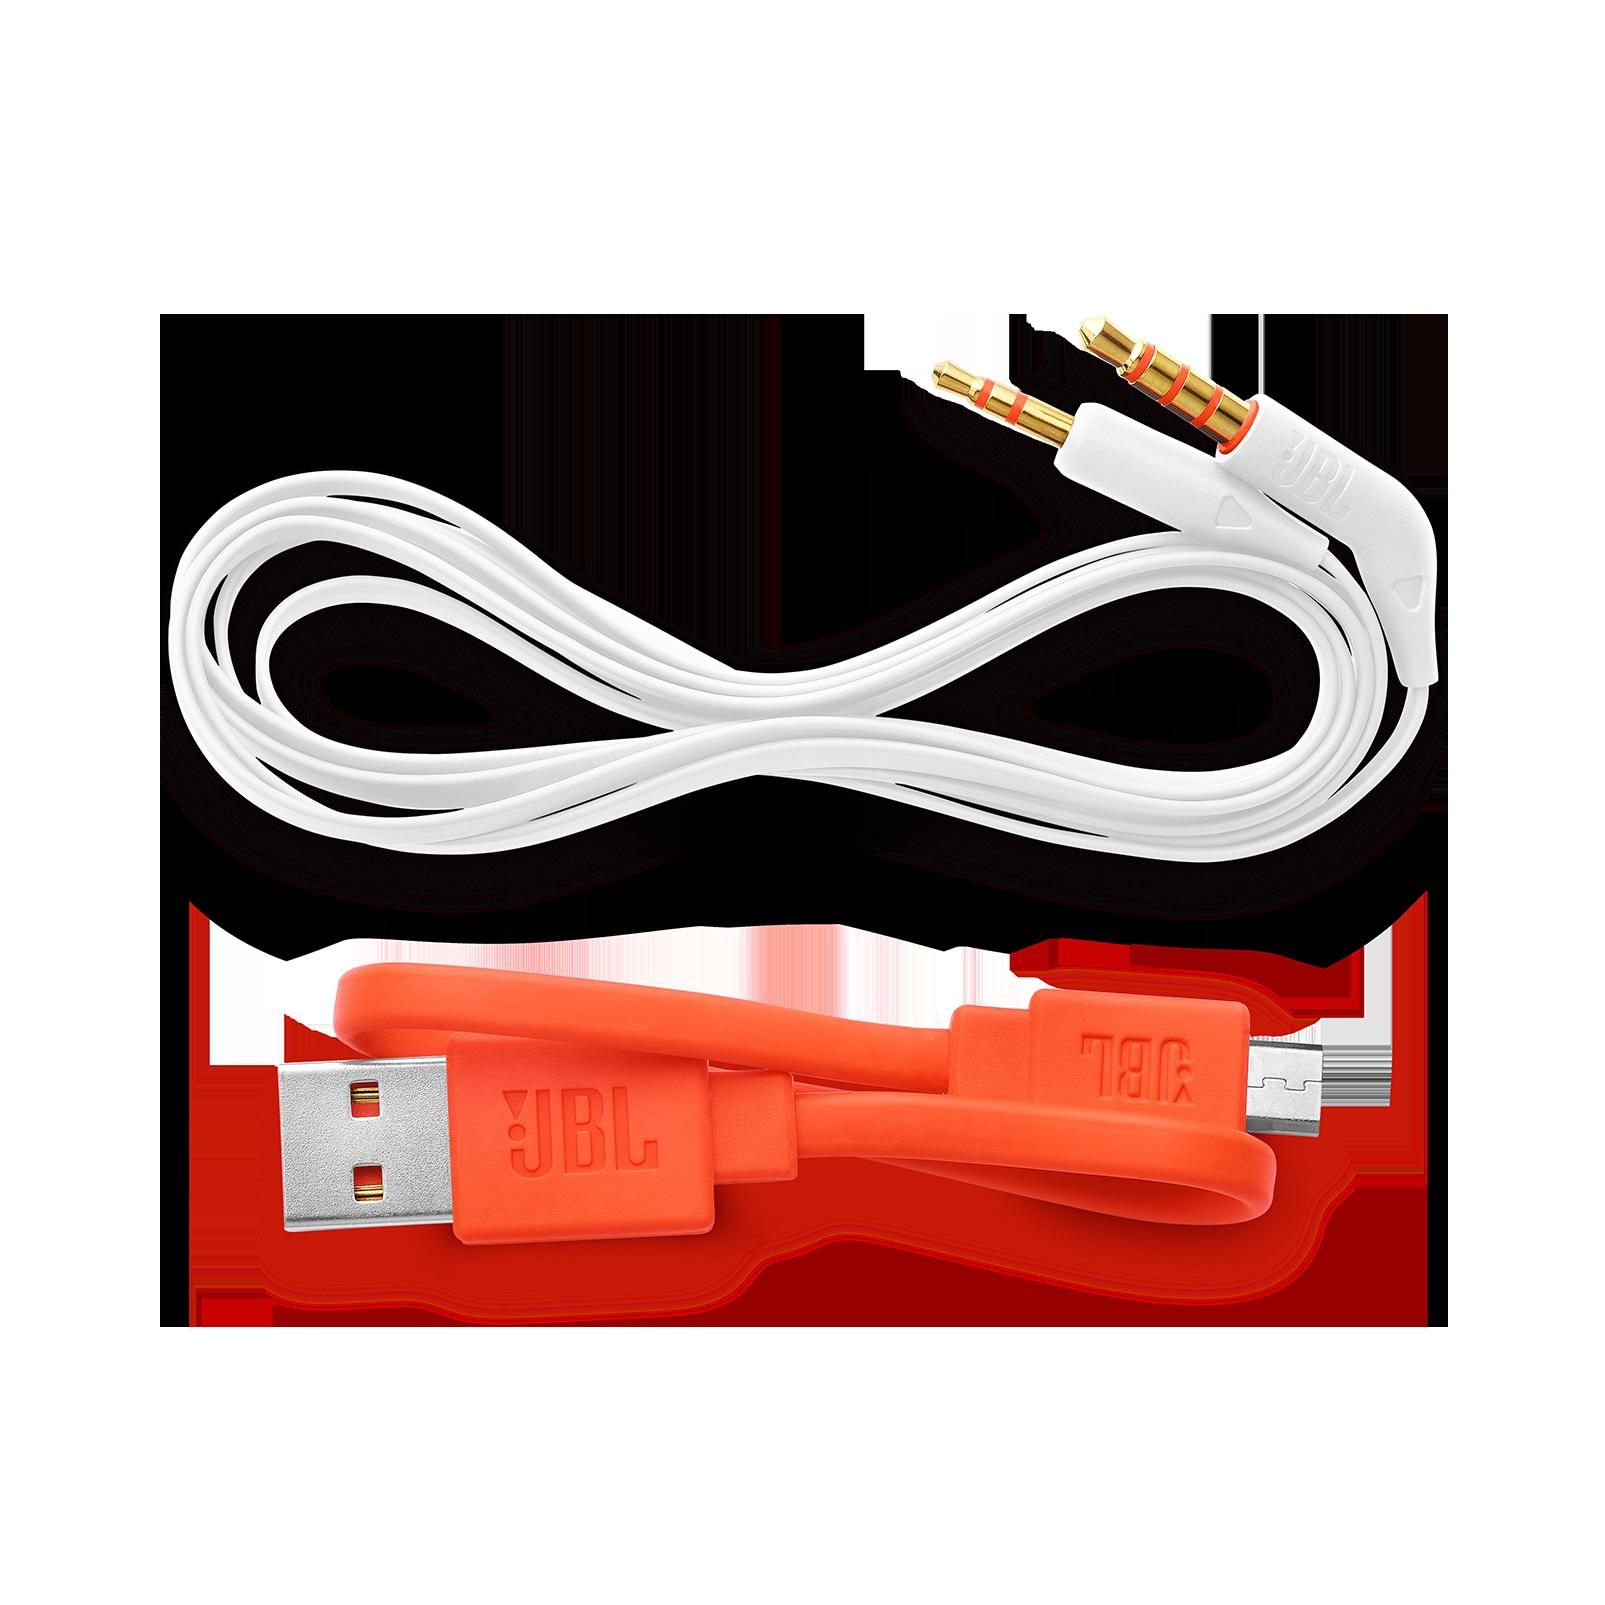 JBL TUNE 600BTNC - White - Wireless, on-ear, active noise-cancelling headphones. - Detailshot 5